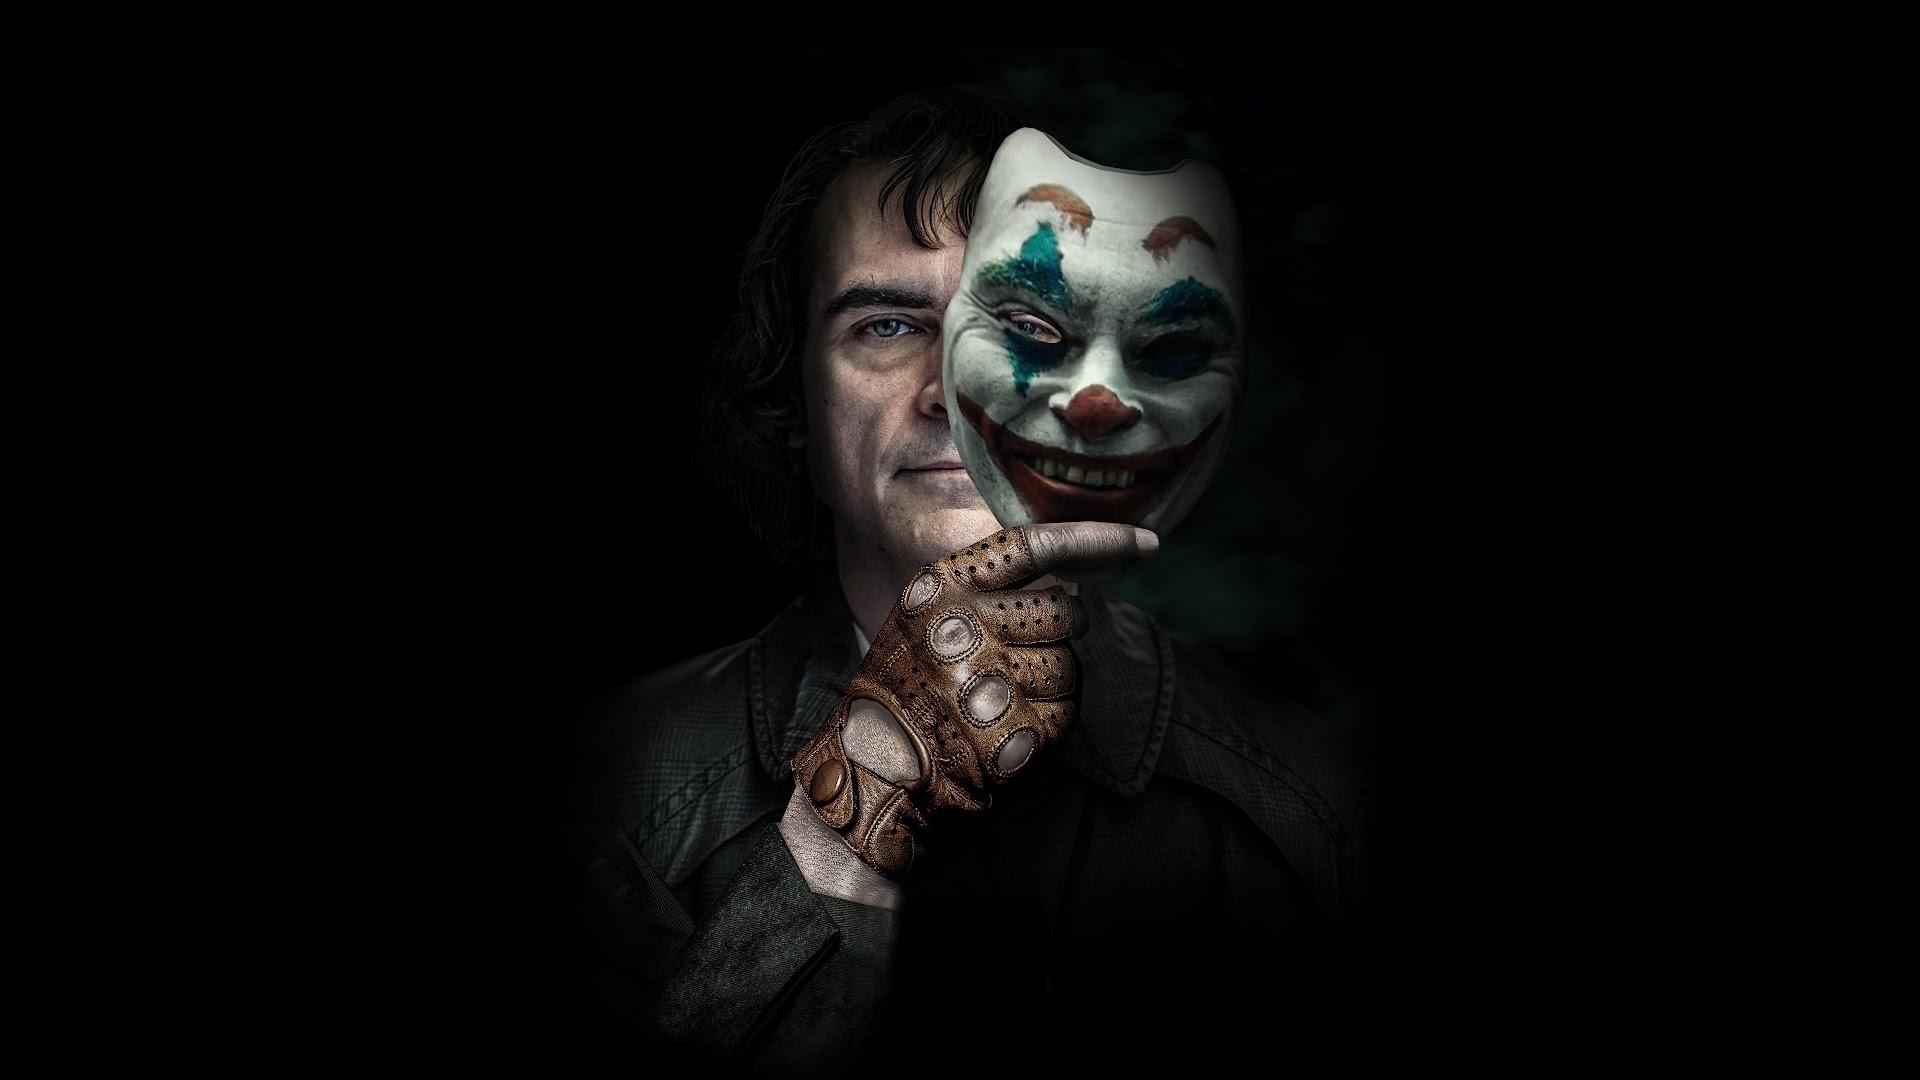 Joker 2019 Joaquin Phoenix 8k Wallpaper 13